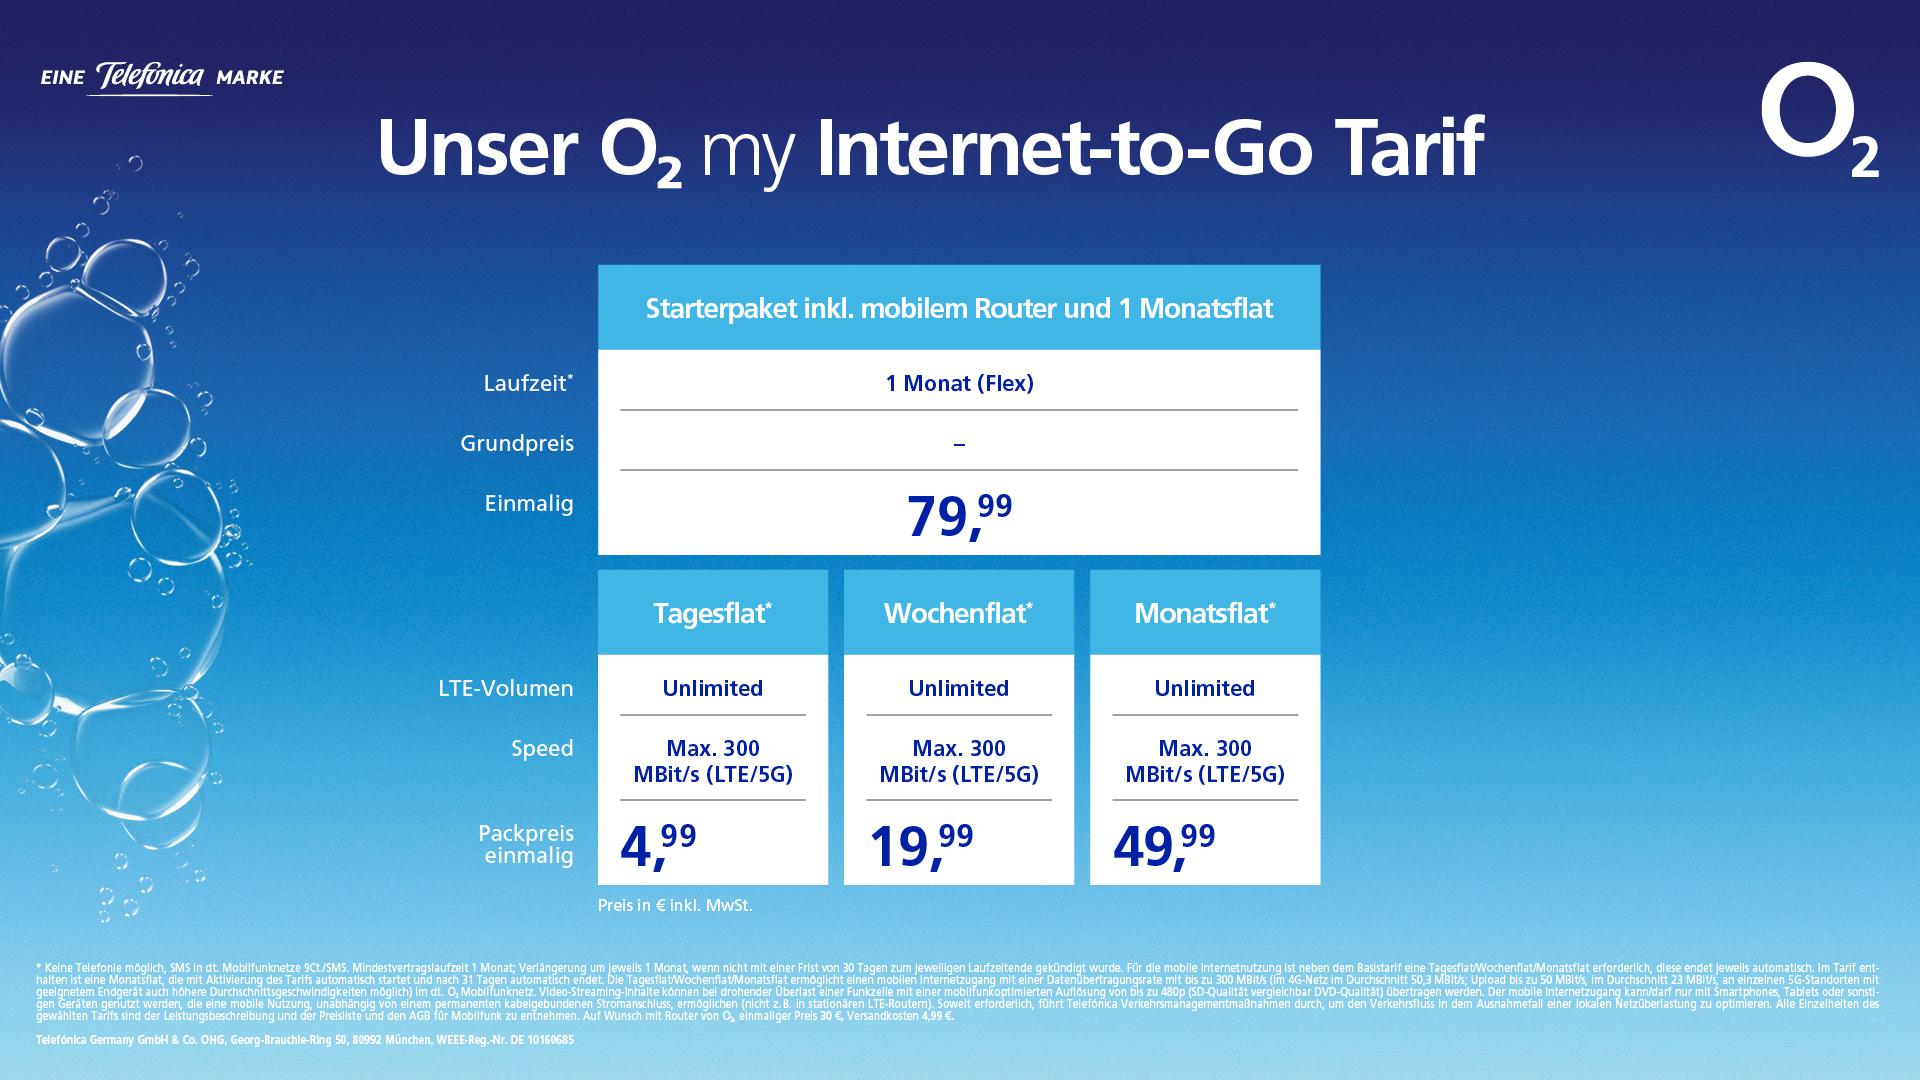 Tariftabelle-o2-my-internet-to-go-.jpg